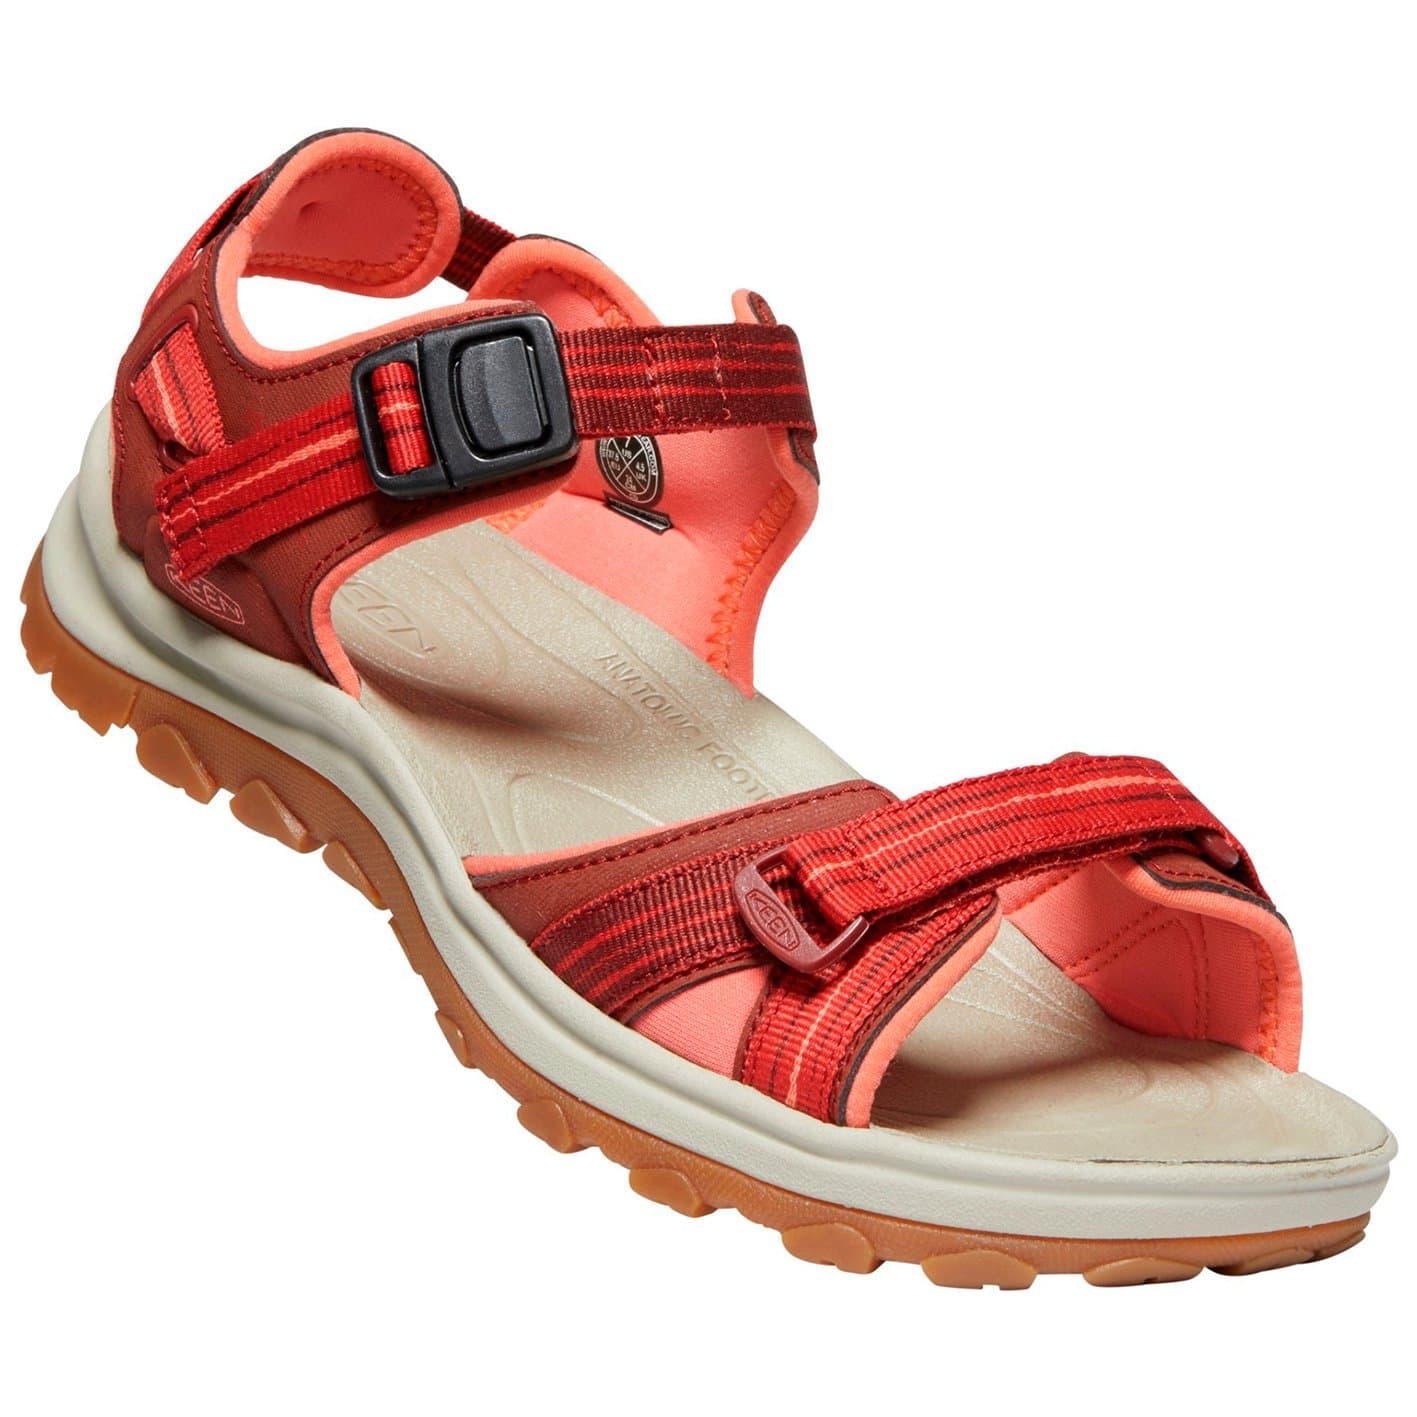 Keen Thargee III Open Toe Sandal Sandales pour femme